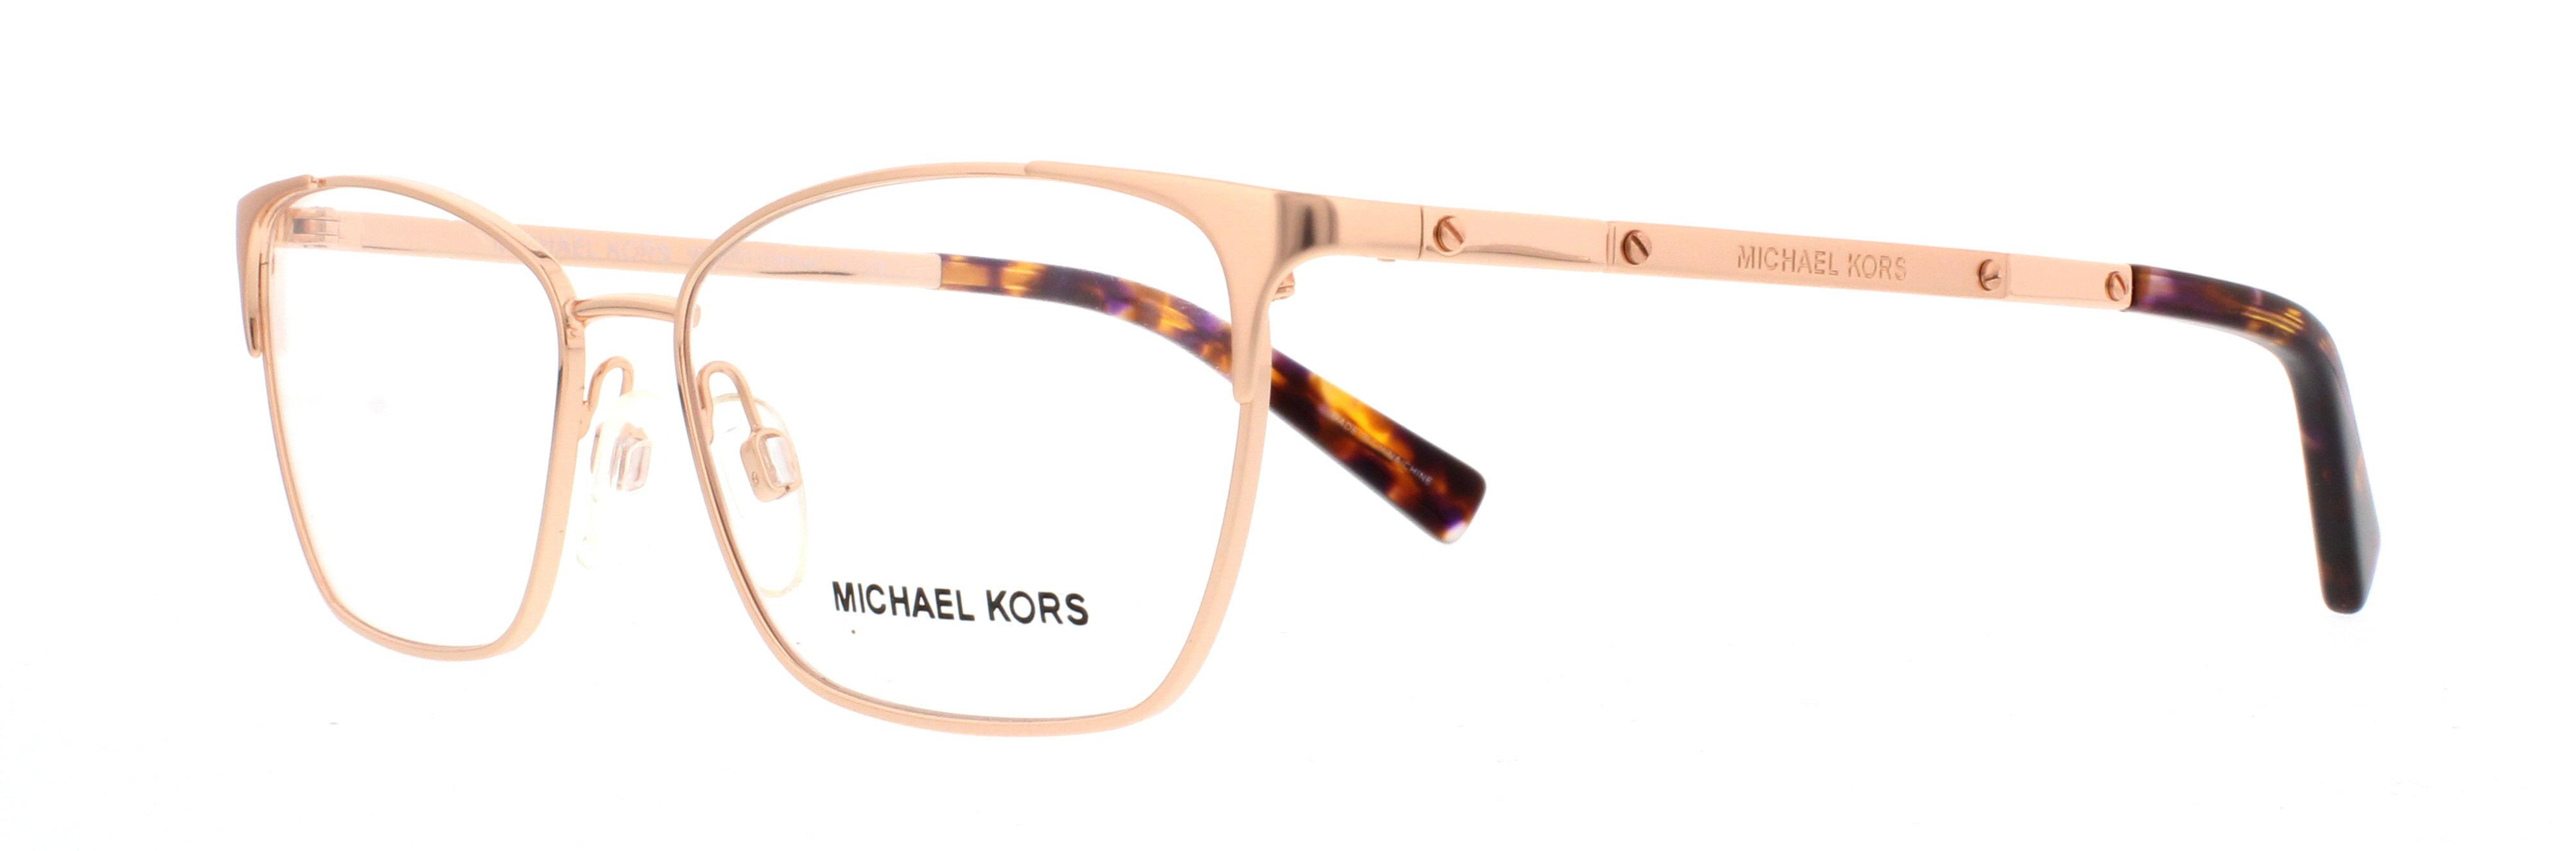 michael kors eyeglasses mk 3001 1026 rose gold 52mm walmart com rh walmart com